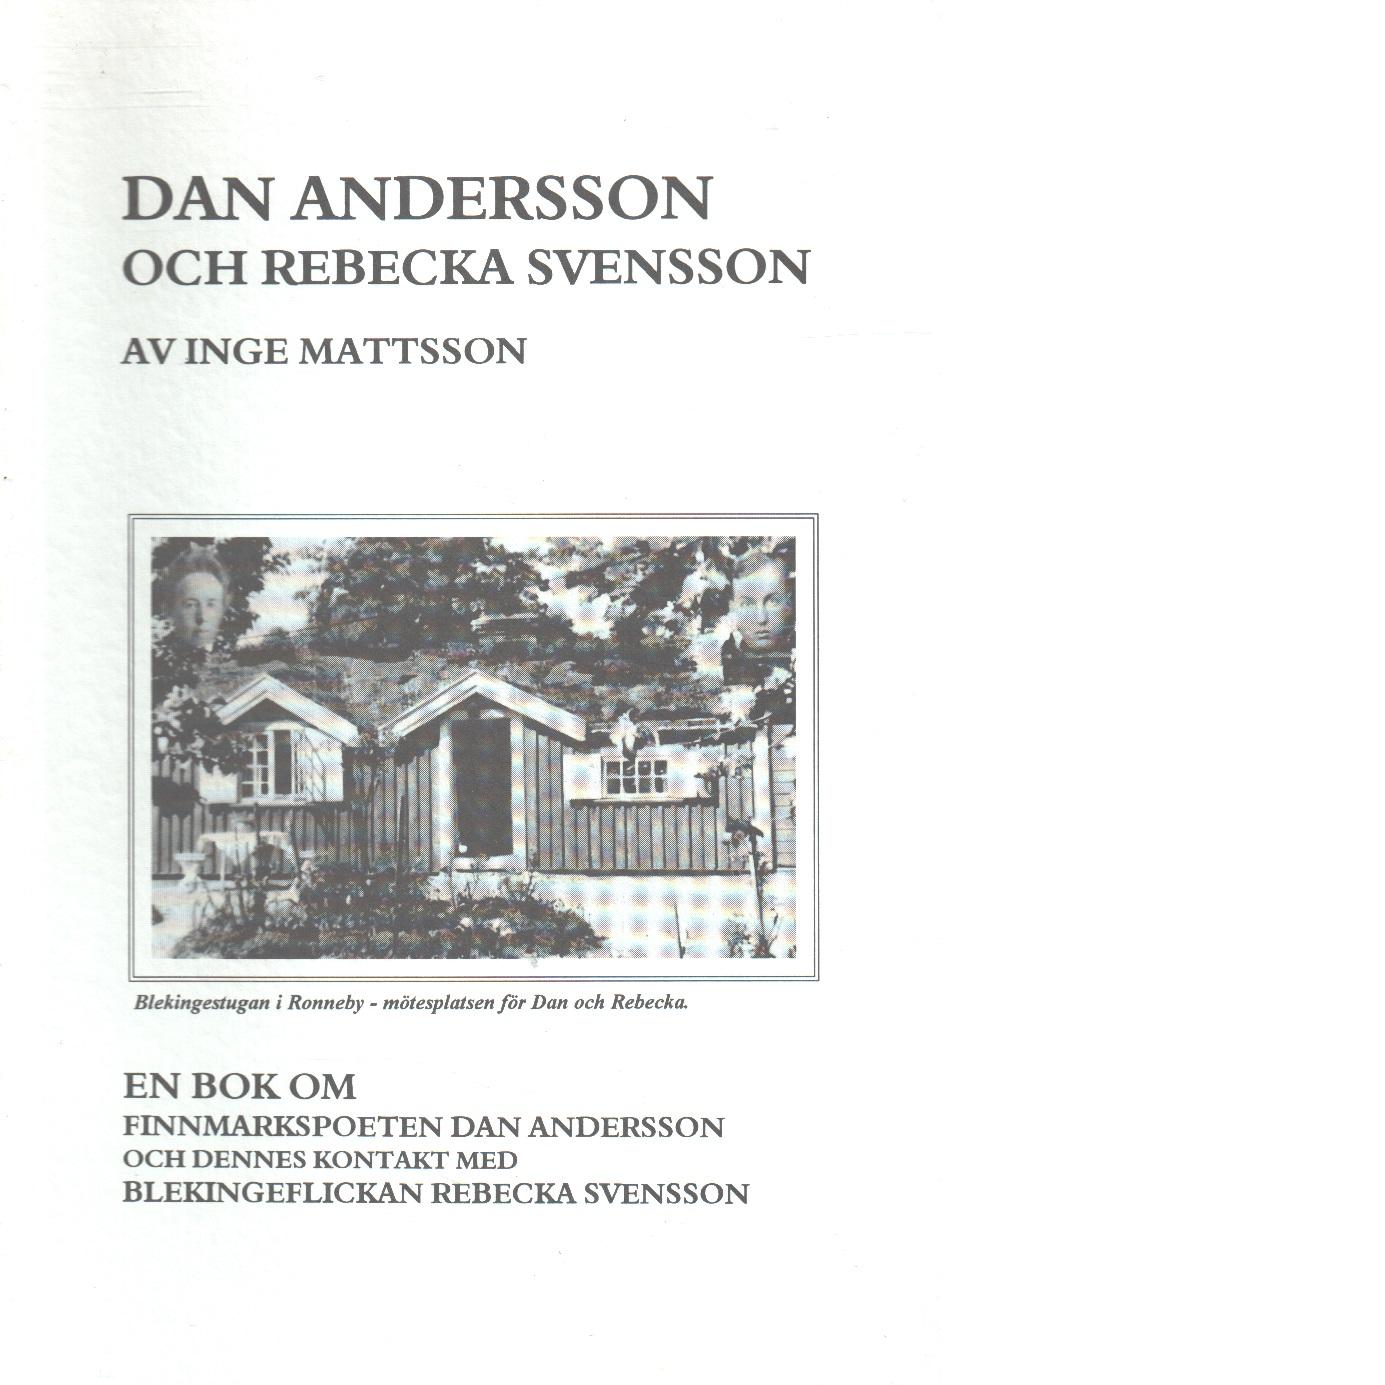 Dan Andersson och Rebecka Svensson - Mattsson, Inge